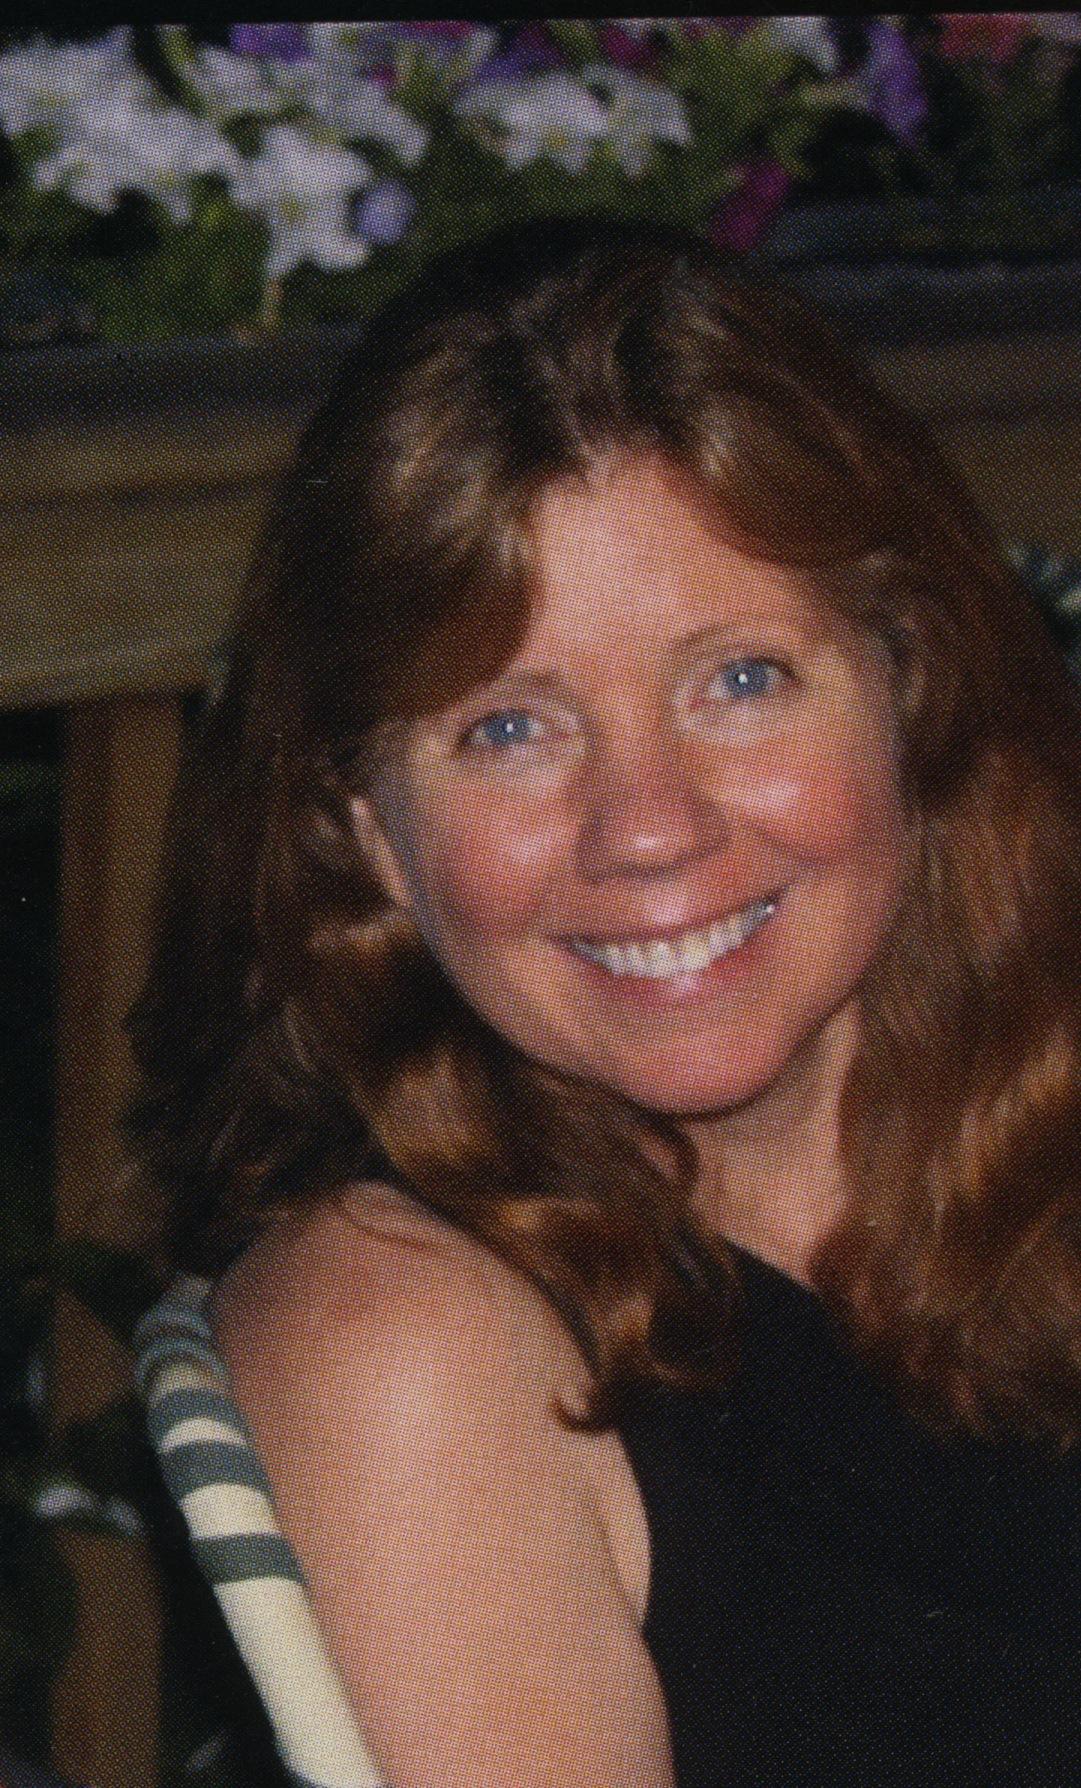 Linda Kahl_from Trish - Linda Kahl.jpeg